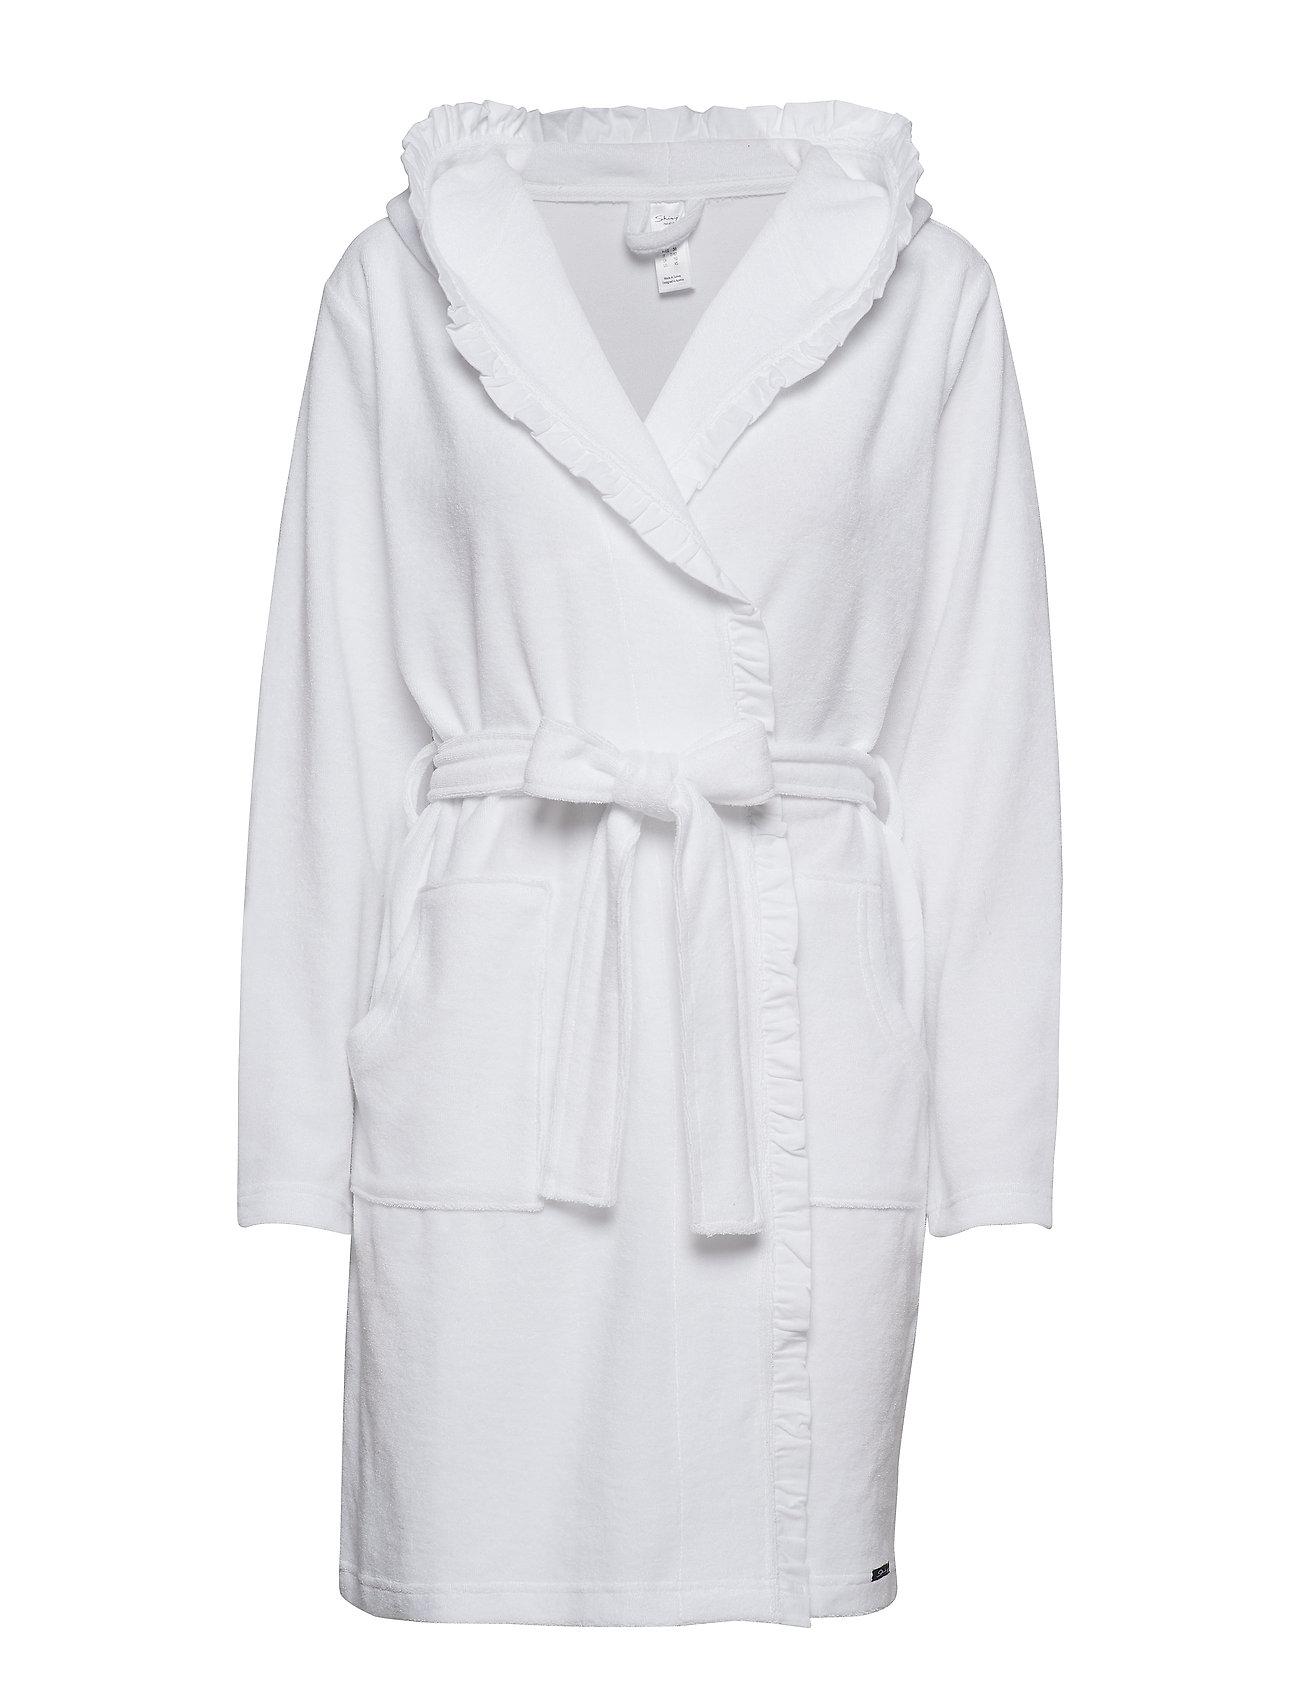 Skiny L. robe - WHITE